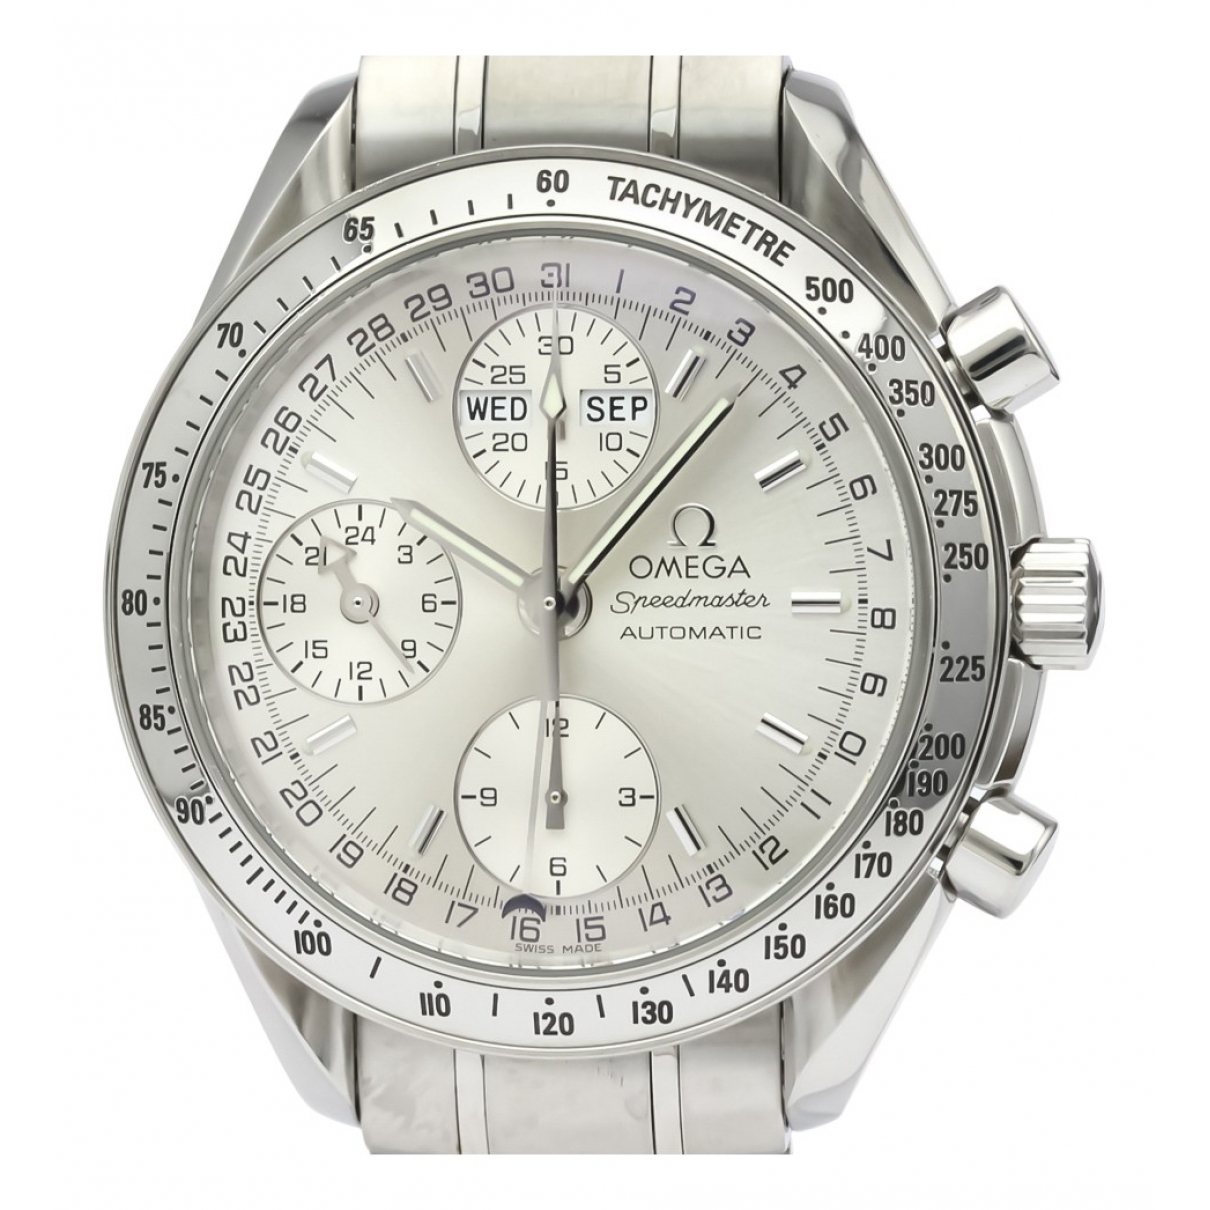 Omega Speedmaster reduced Uhr in  Silber Stahl